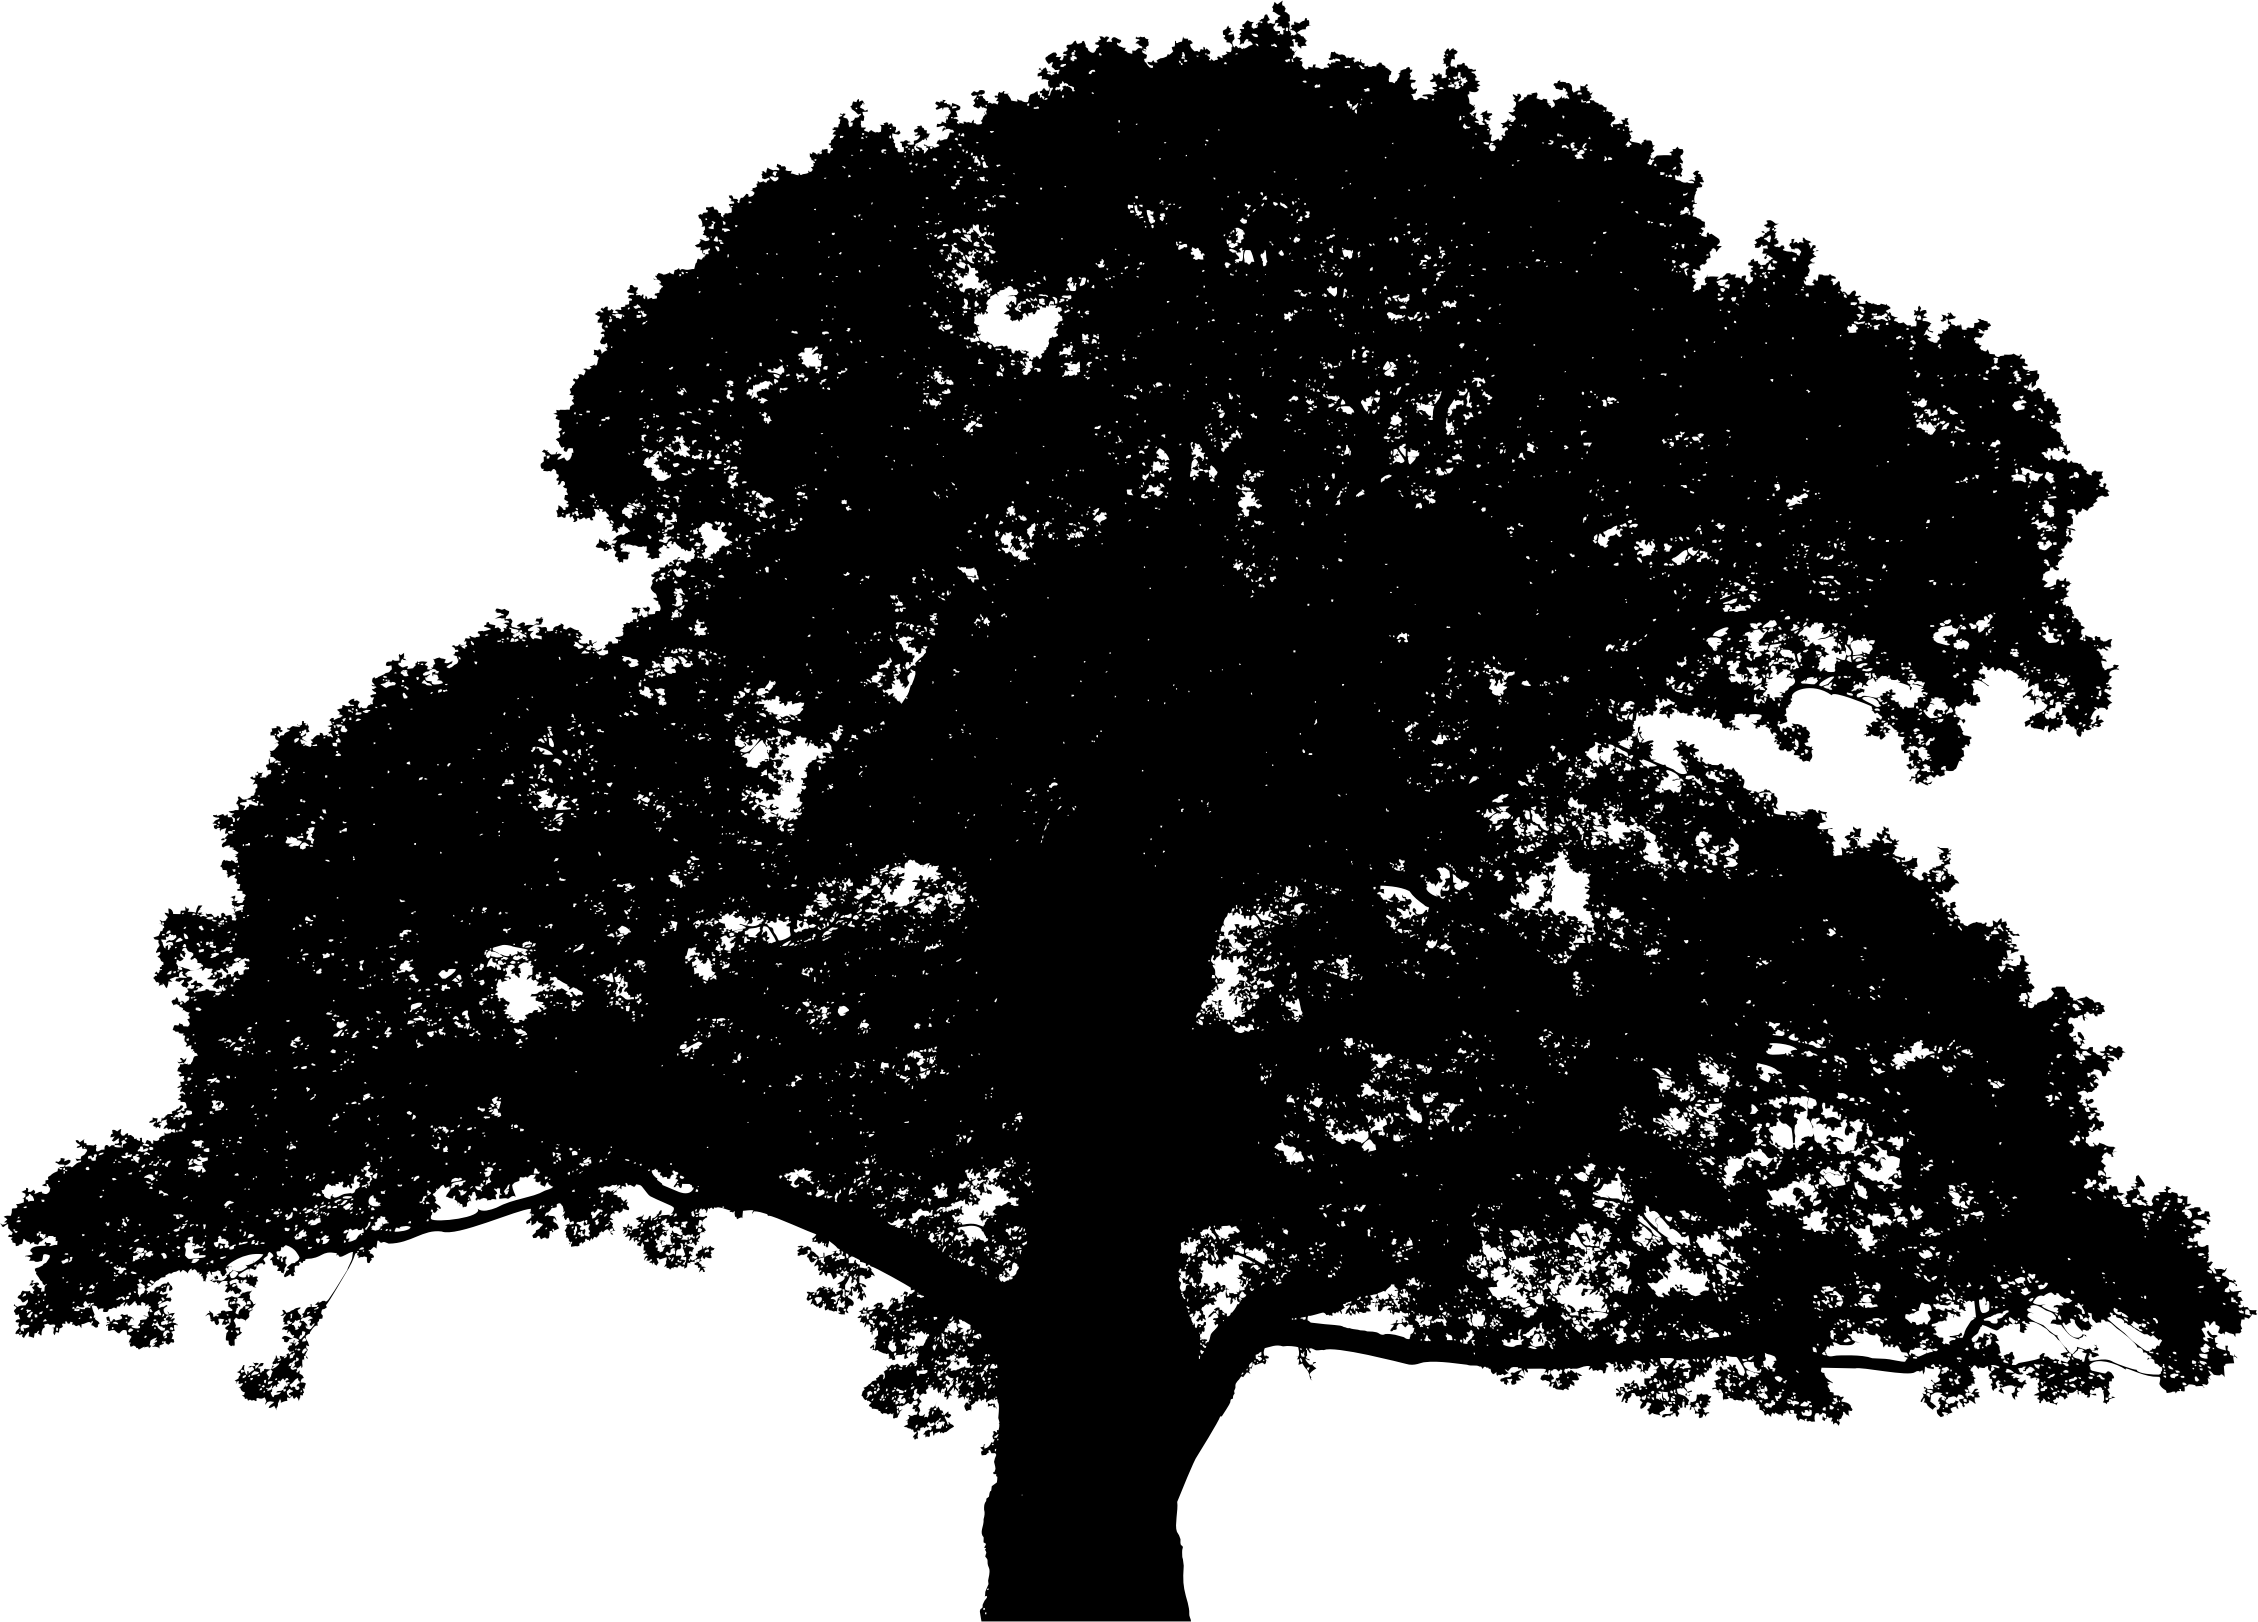 2258x1622 Clipart